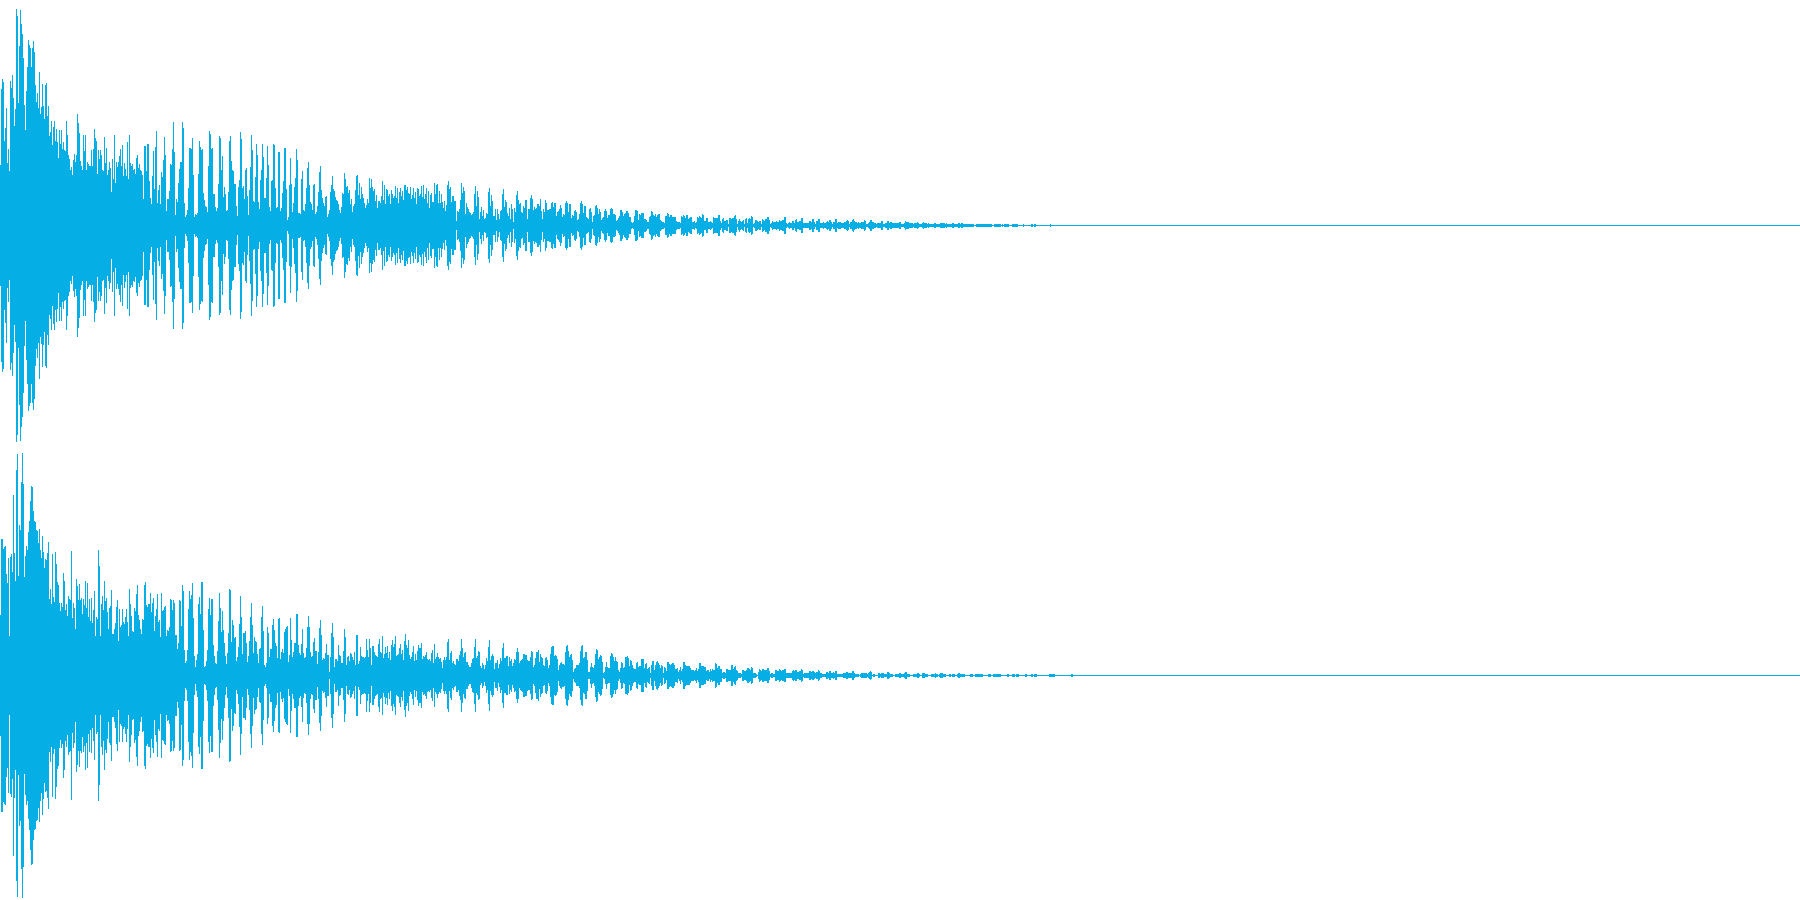 DigitalGun デジタルな銃撃音の再生済みの波形